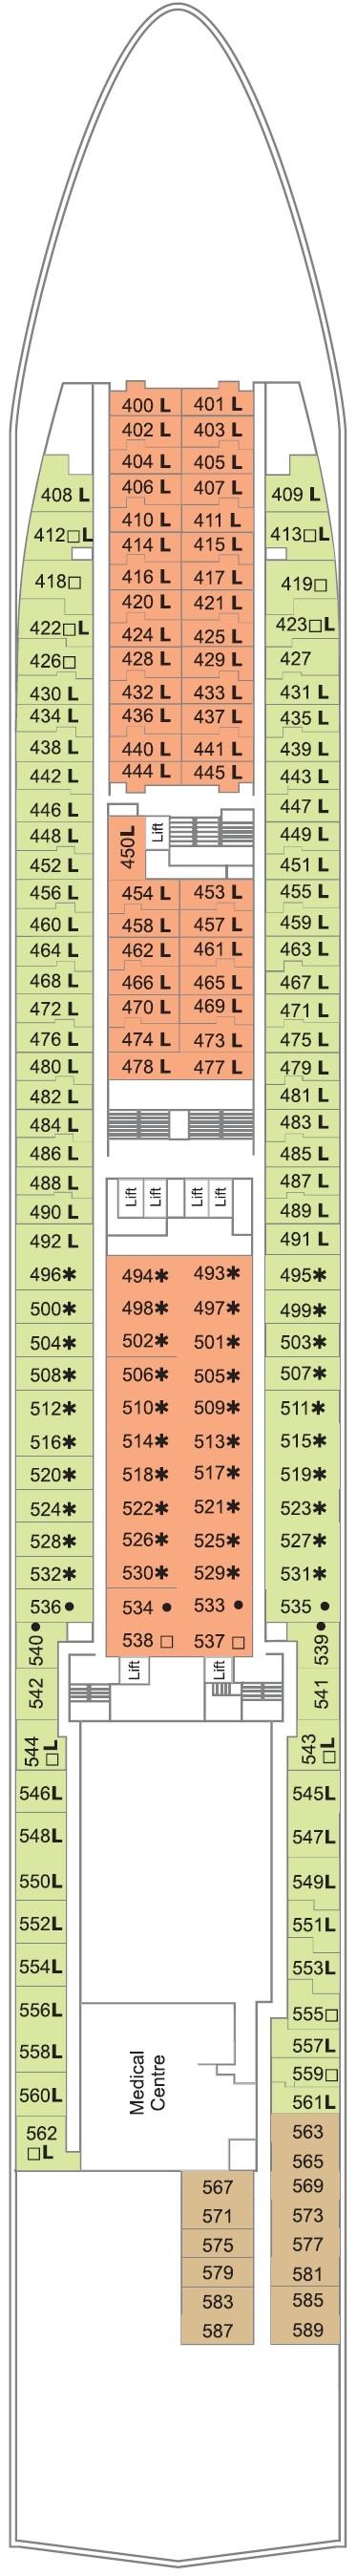 Deck Plan for Deck 3